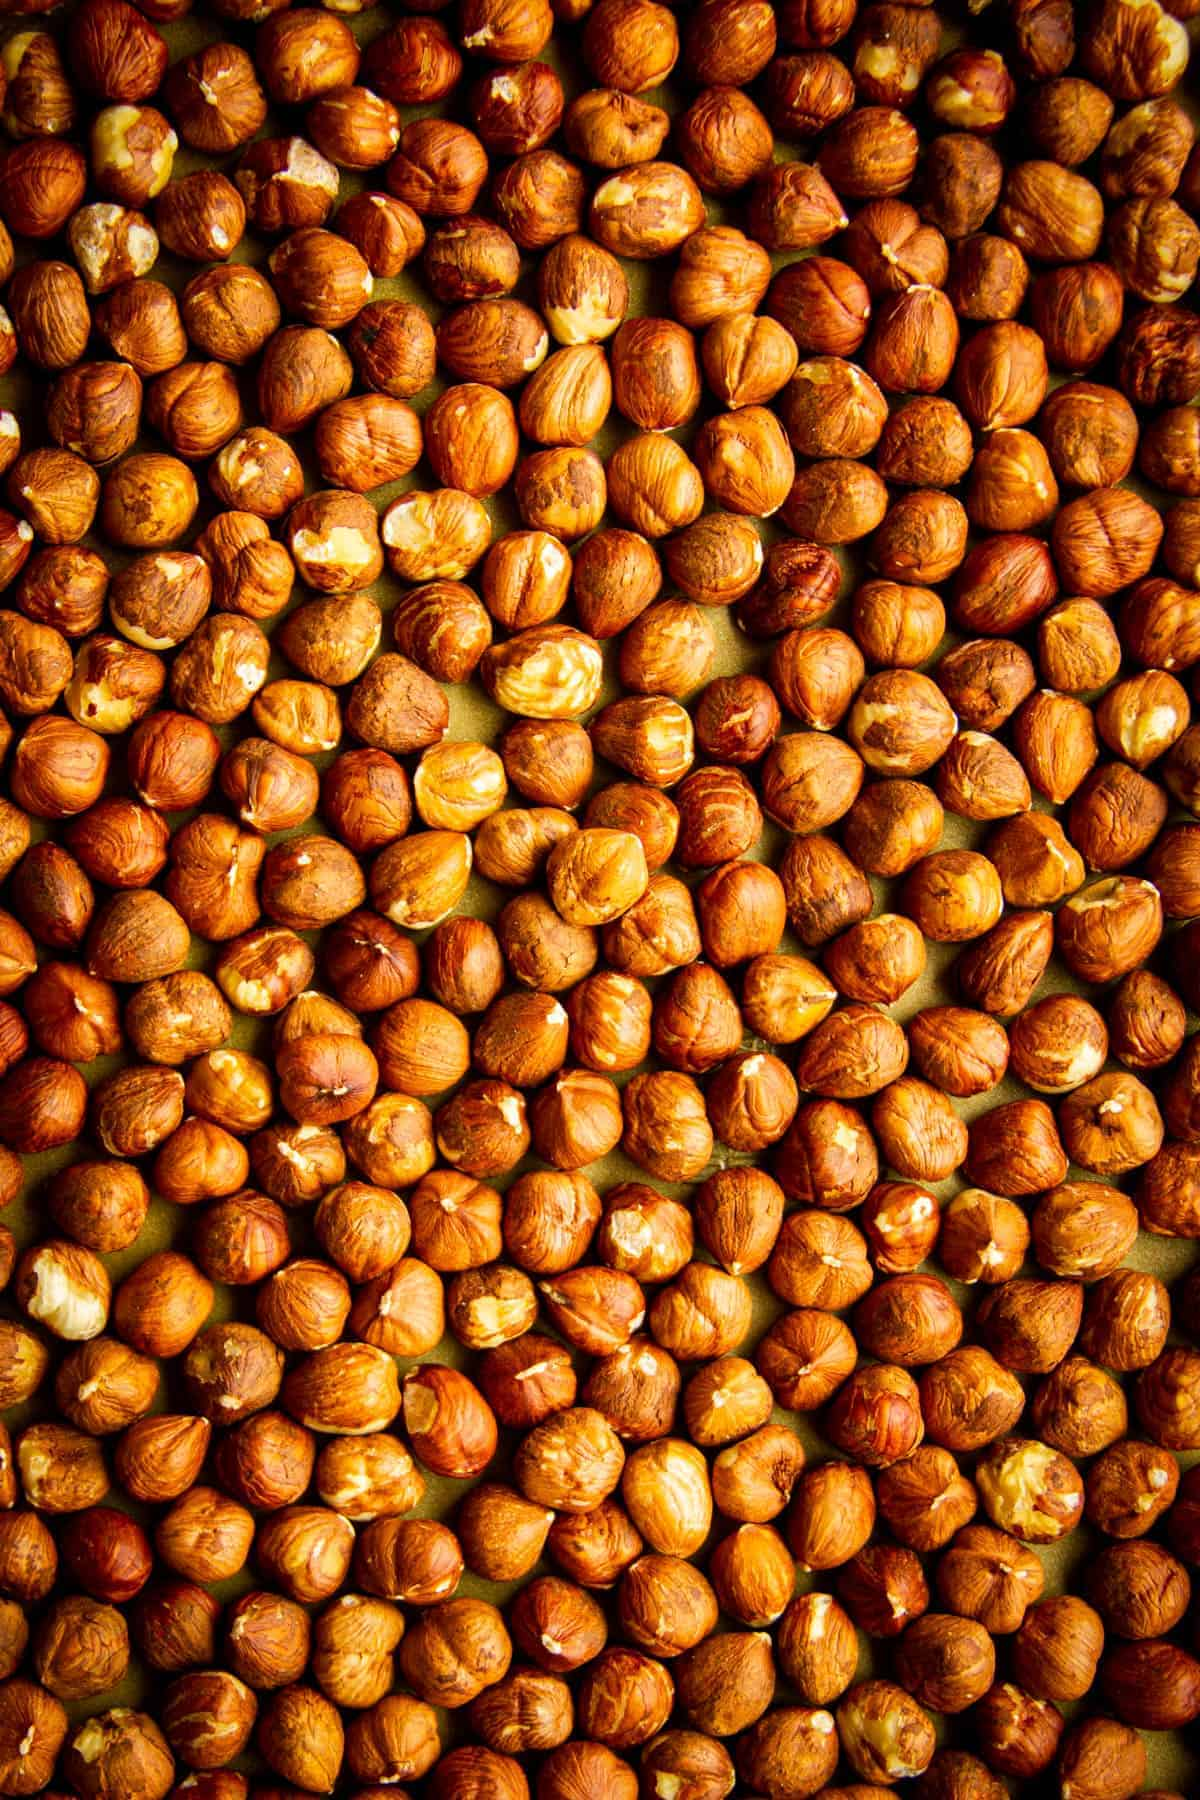 roasted-hazelnuts-close-up-on-a-tray